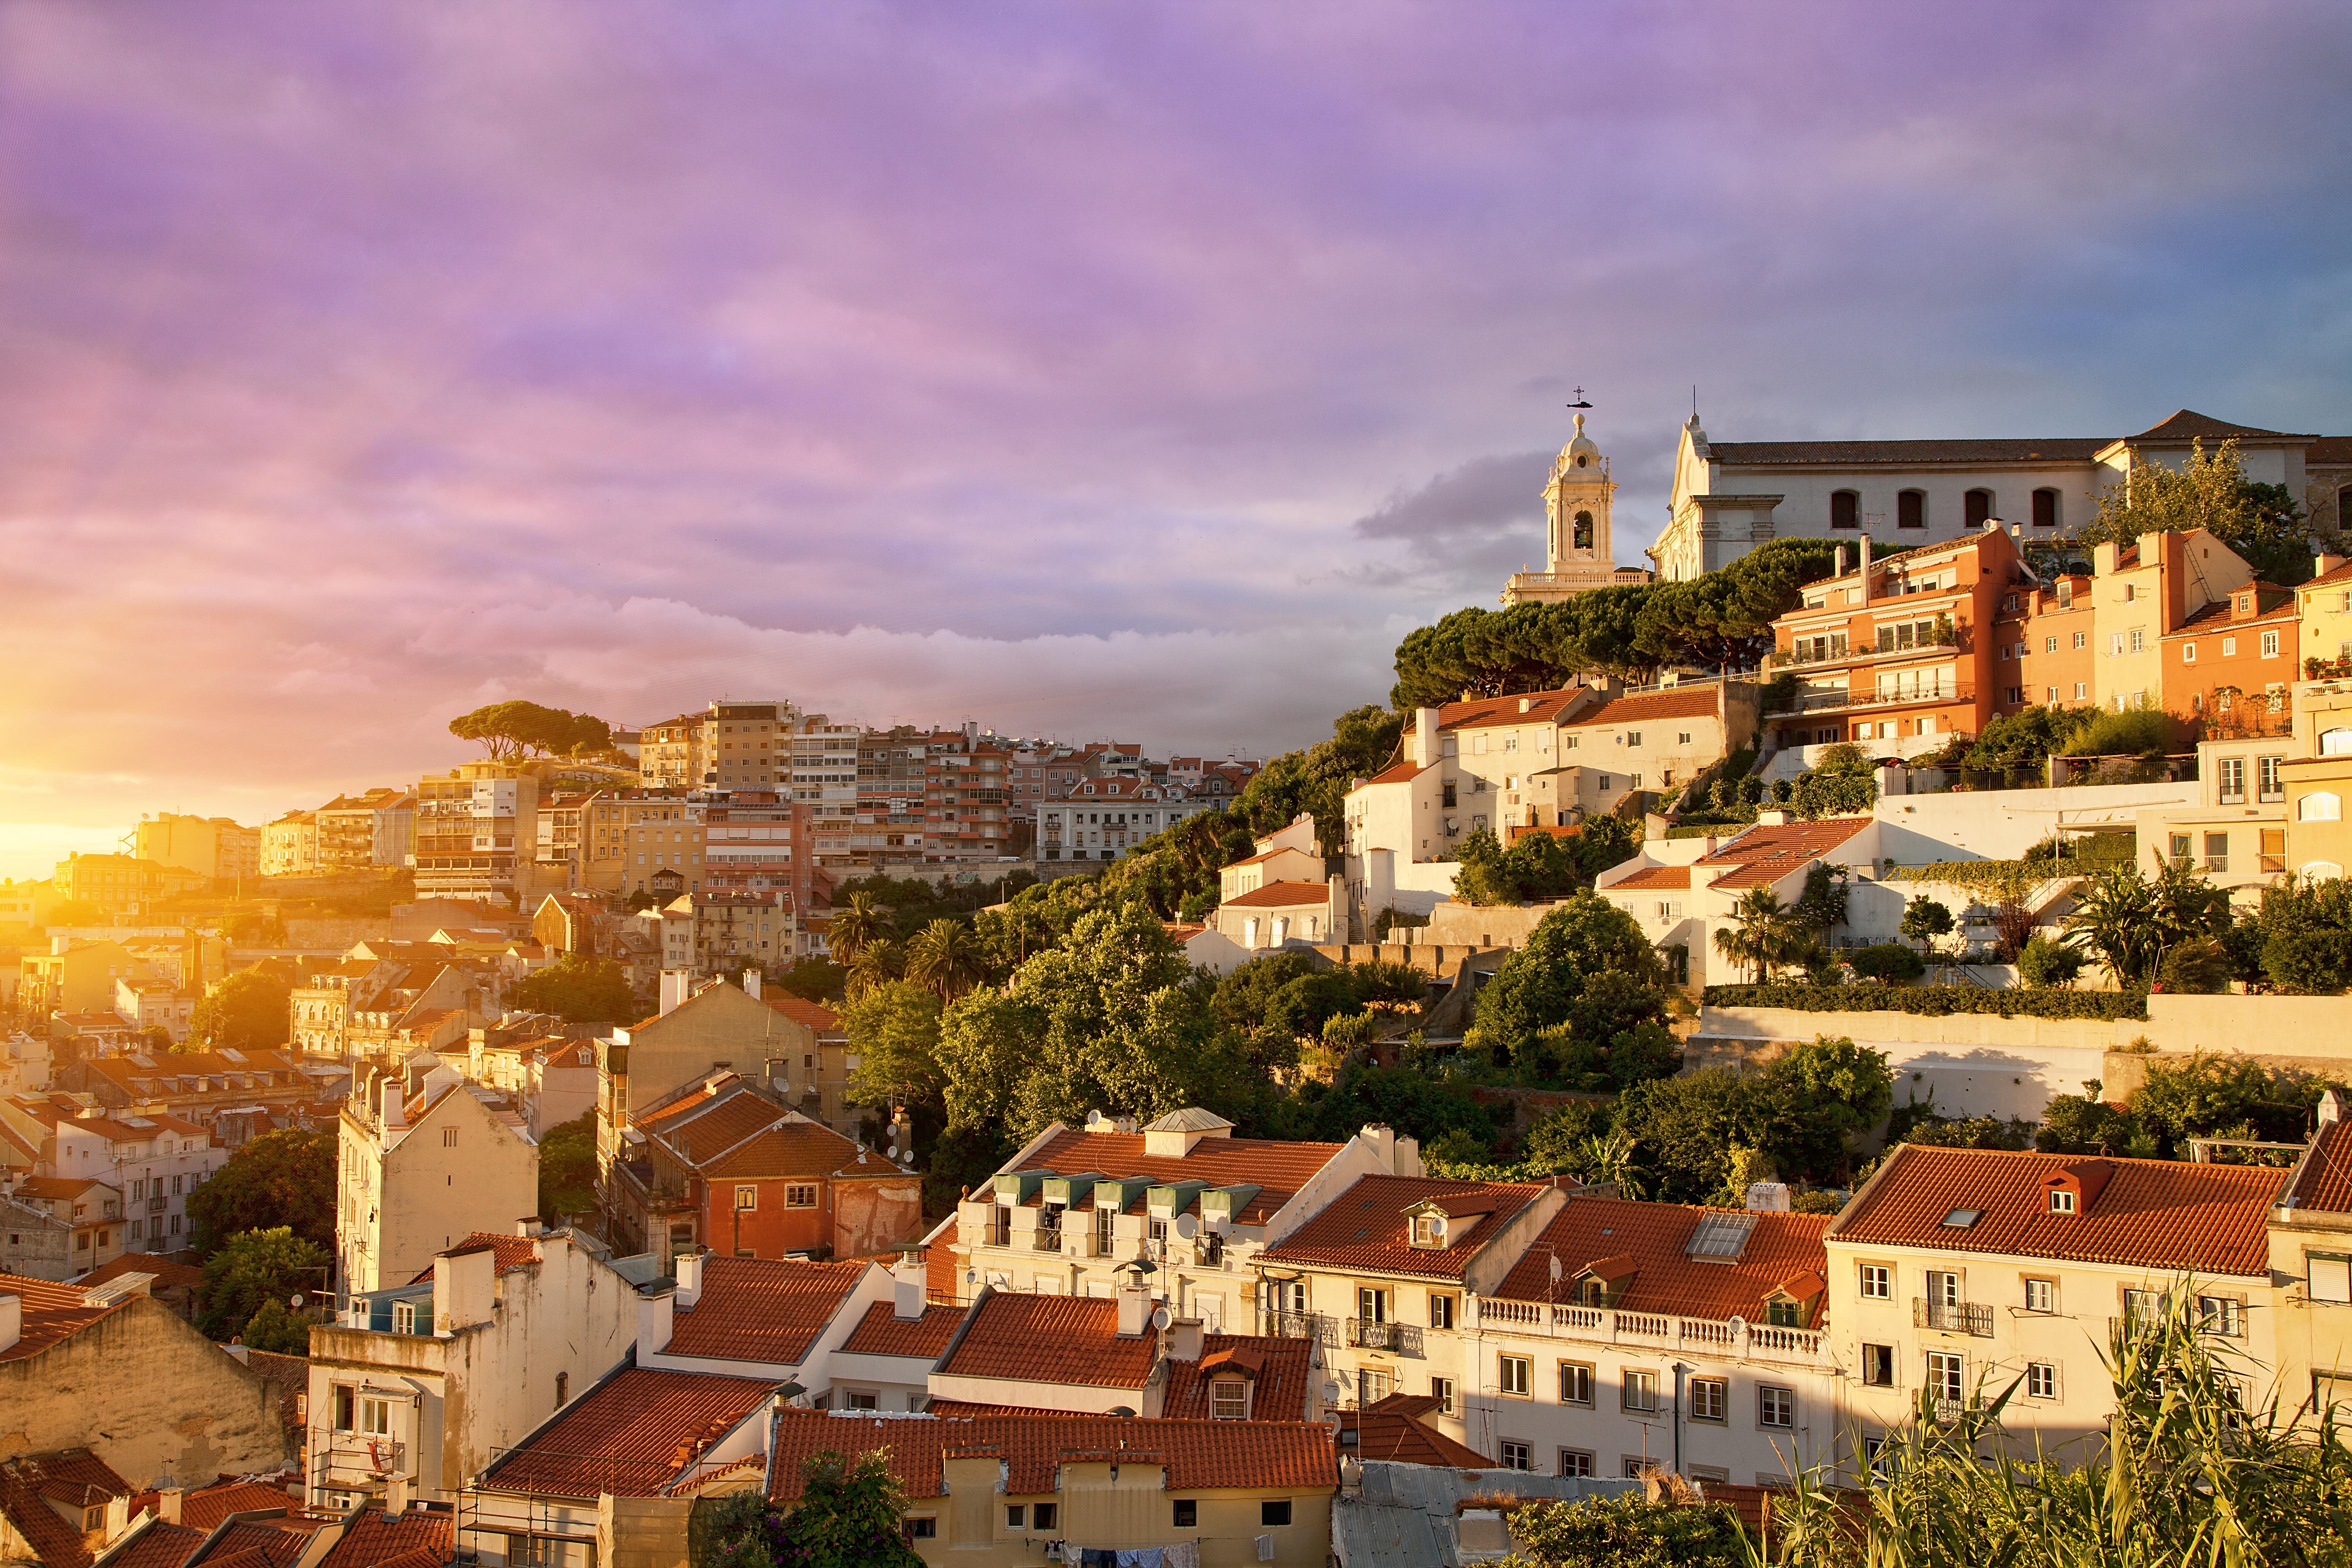 Portugal, Lisbon, Old Town, church and Miradouro de Graca at Sunset